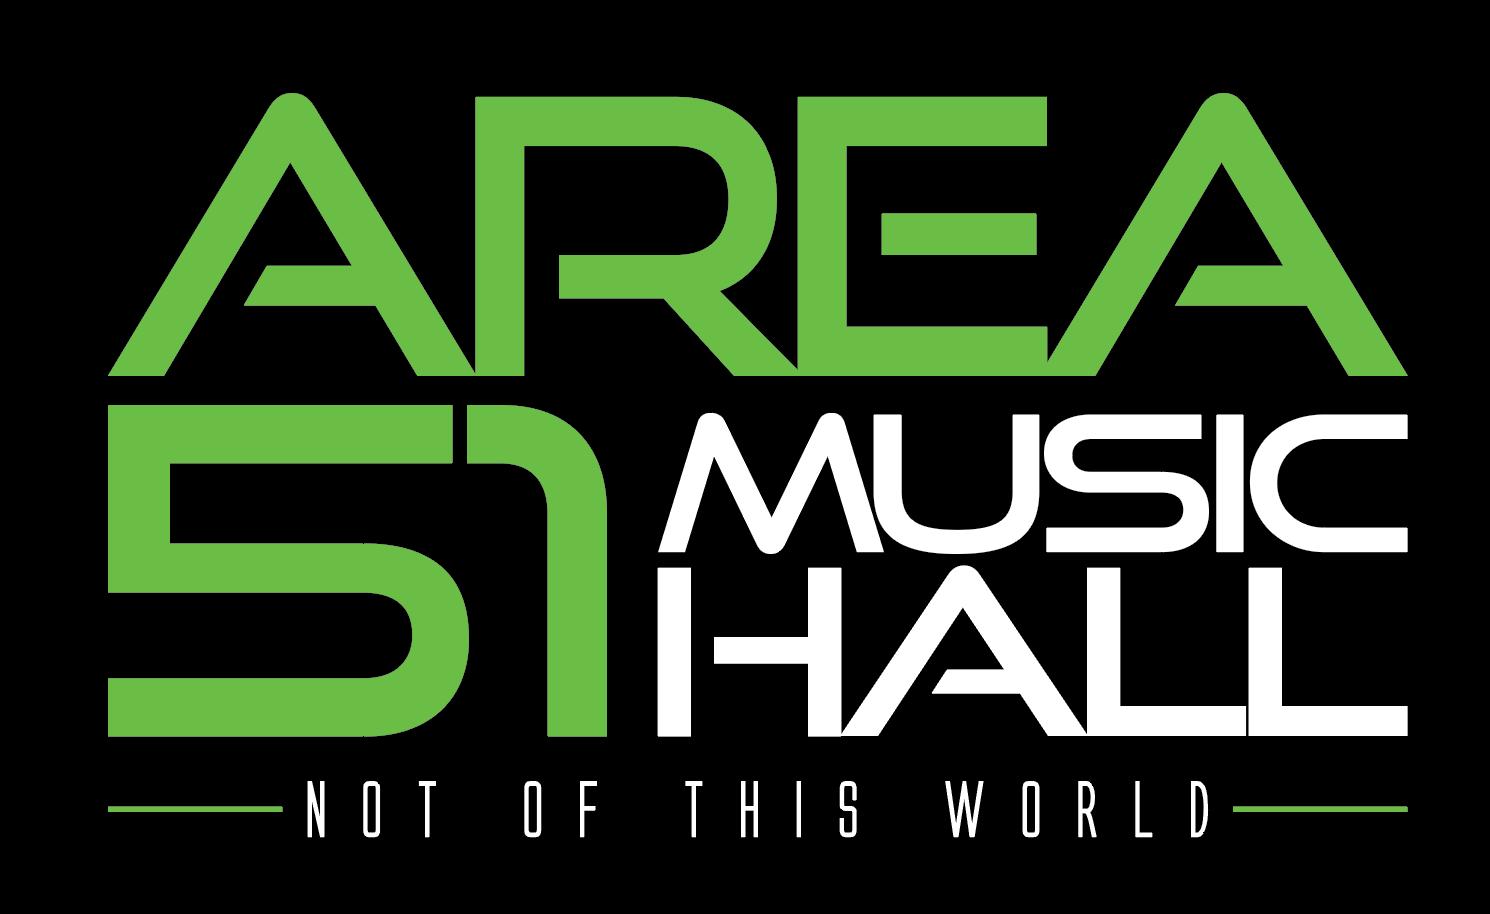 Area 51 Music Hall - Logo Design